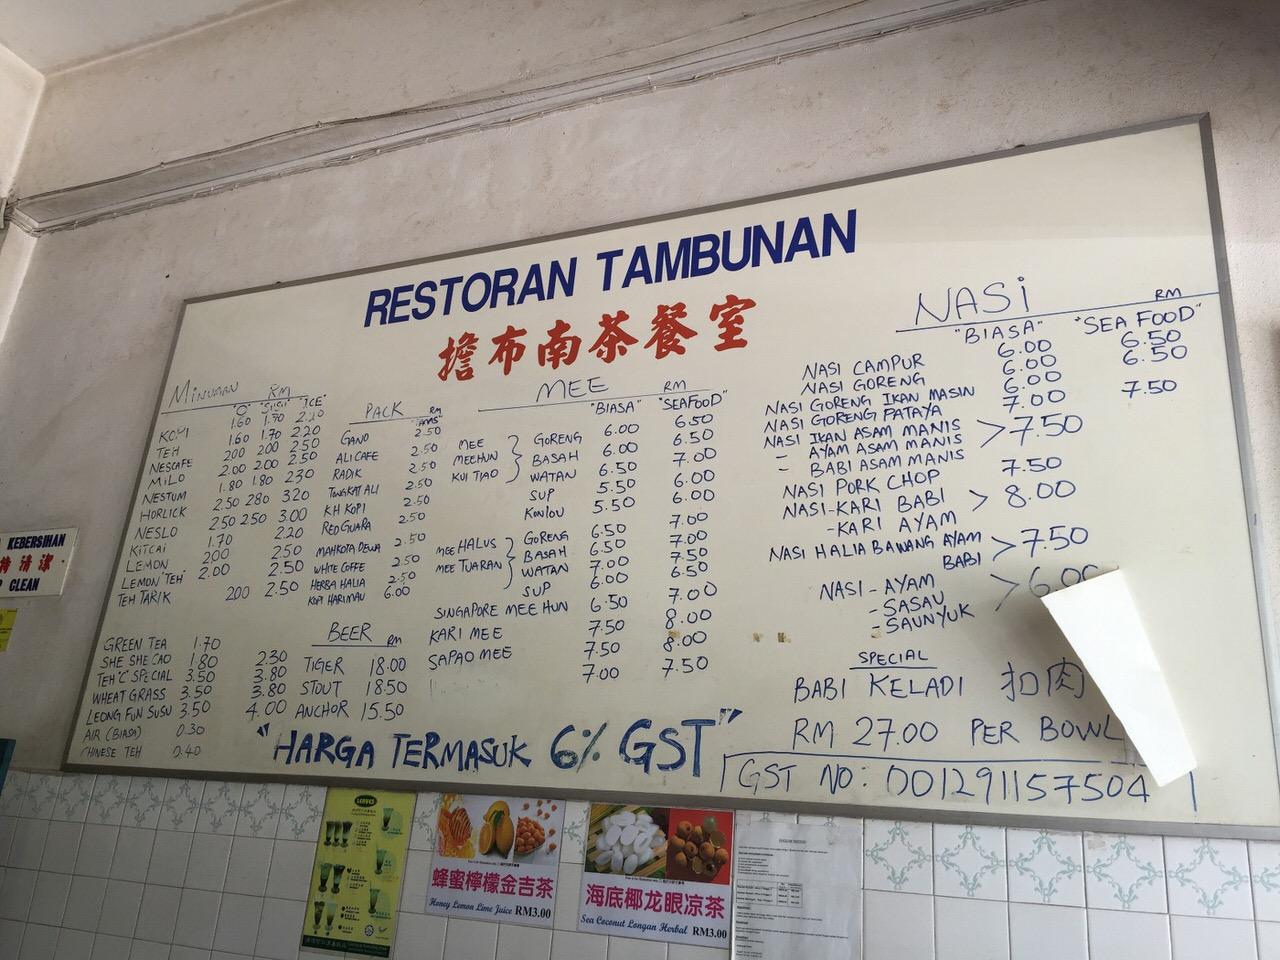 Tambunan restaurant 4617